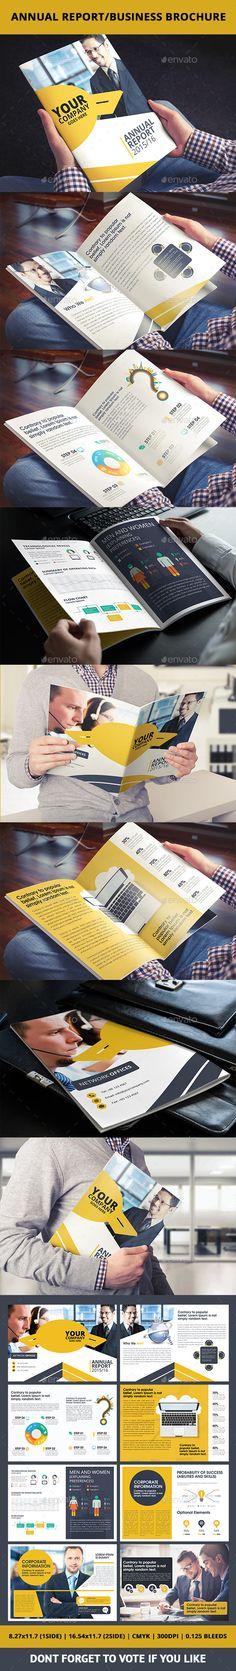 Annual Report/Business Brochure Template #design Download: http://graphicriver.net/item/annual-reportbusiness-brochure/10367767?ref=ksioks